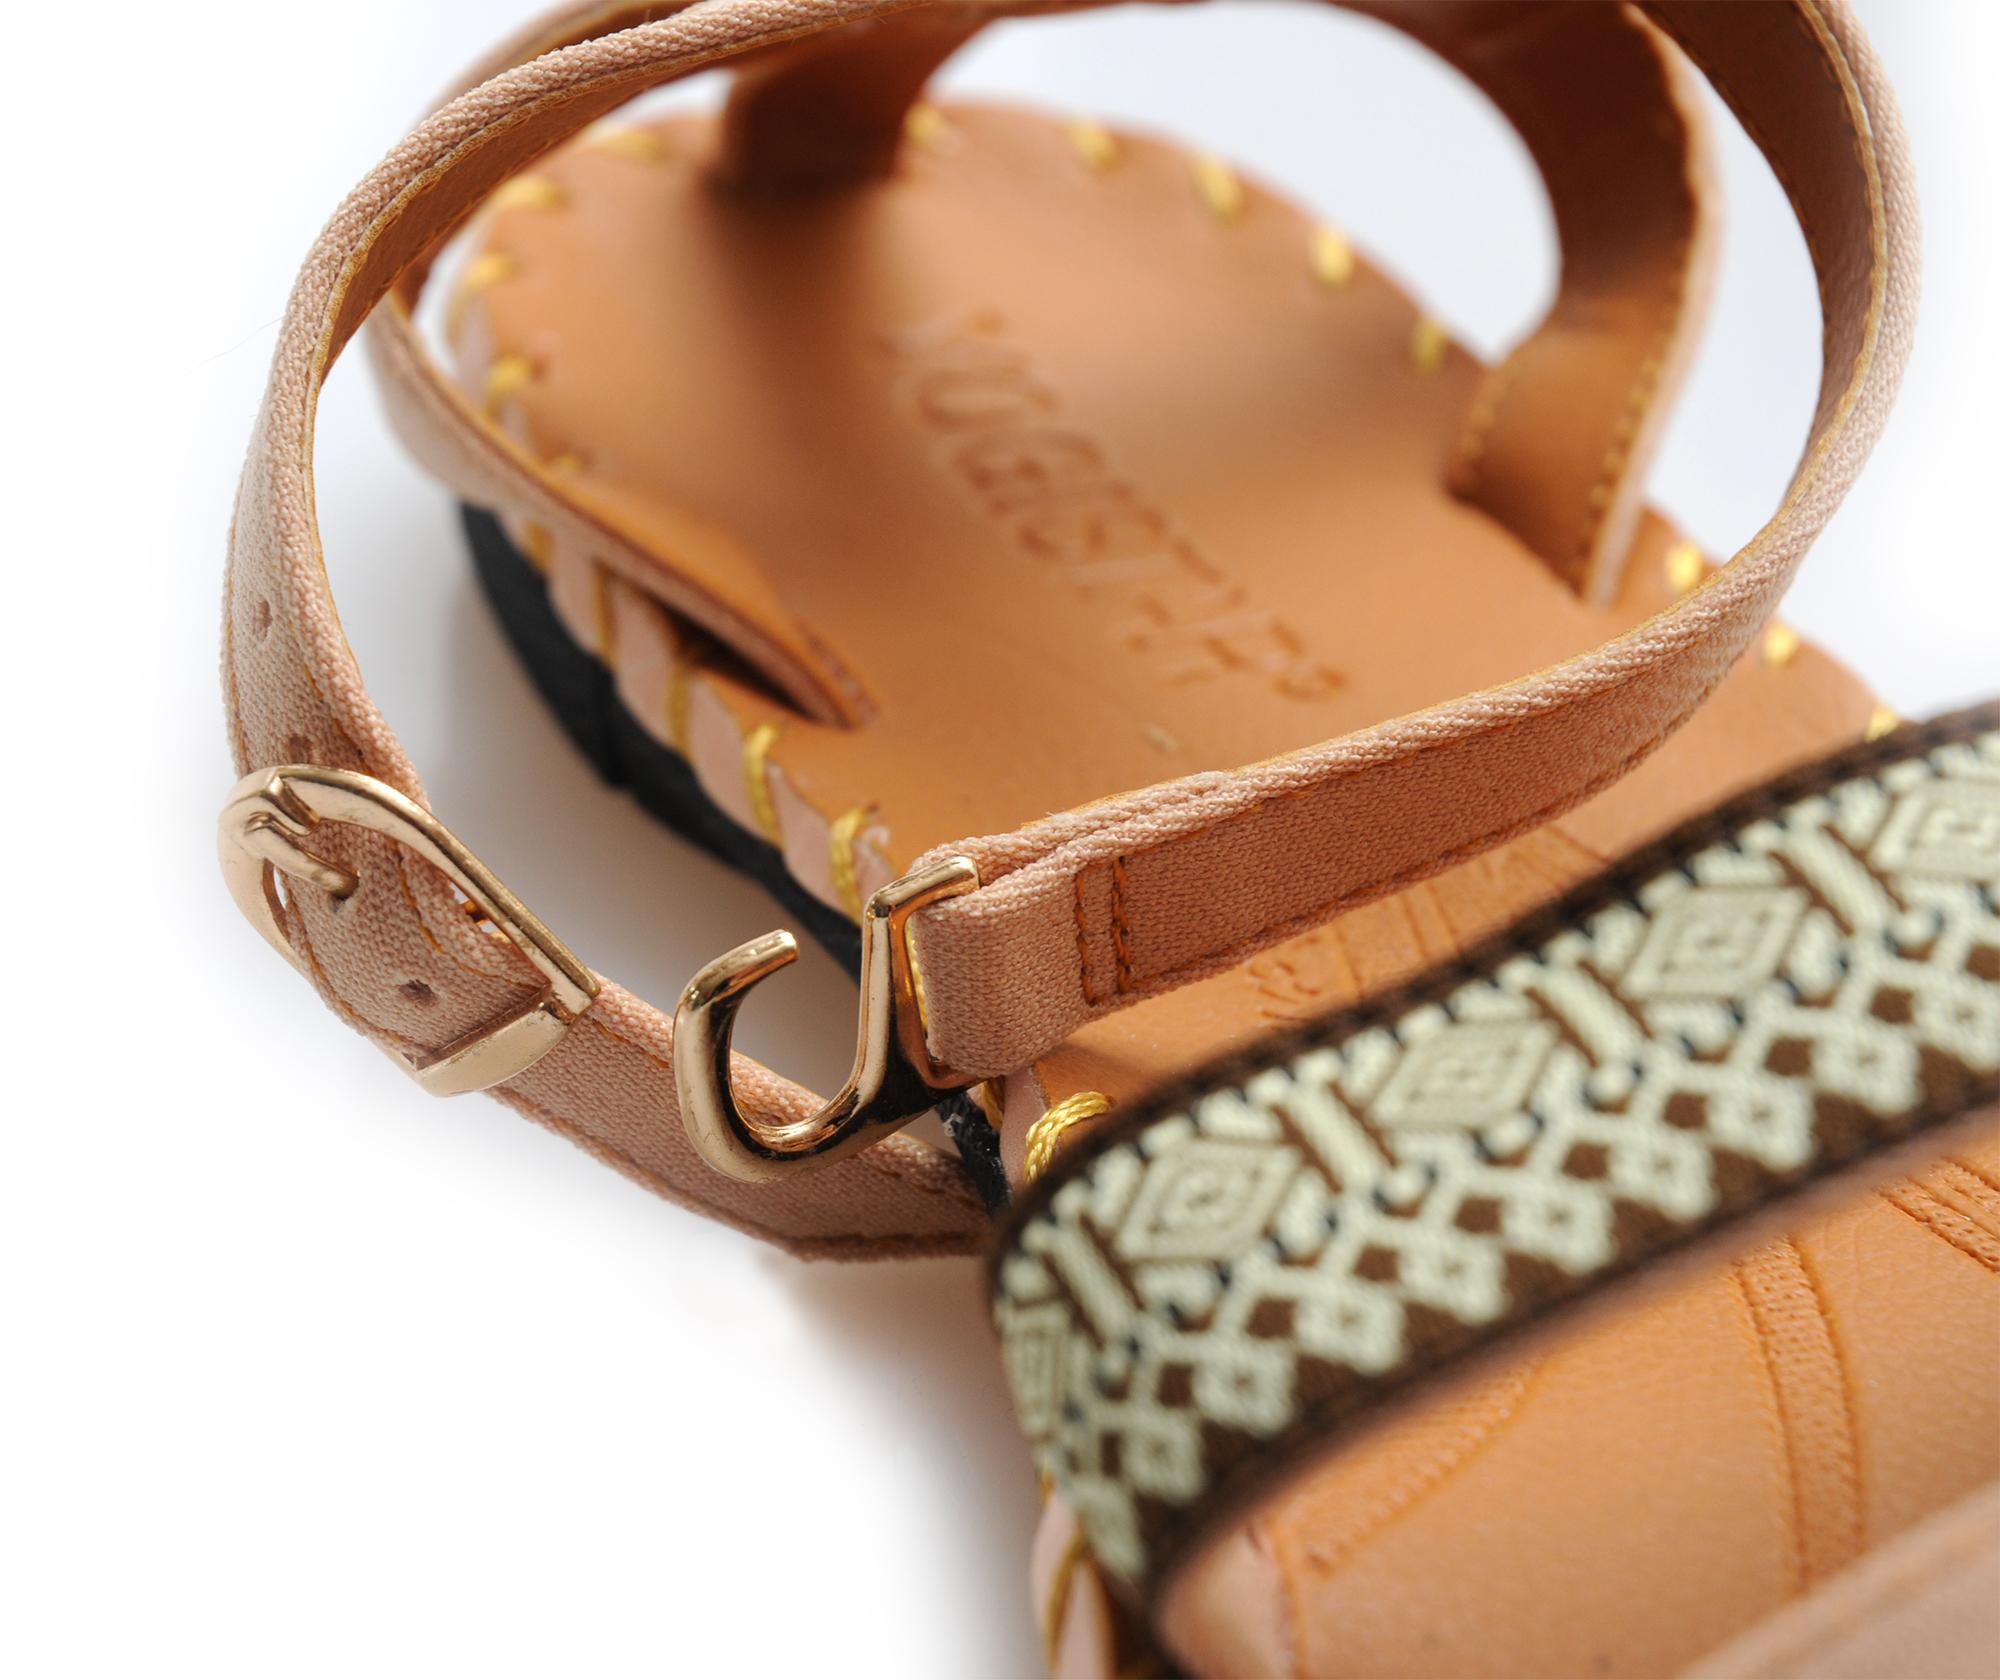 Yoga-Sandalen easy strap - beige